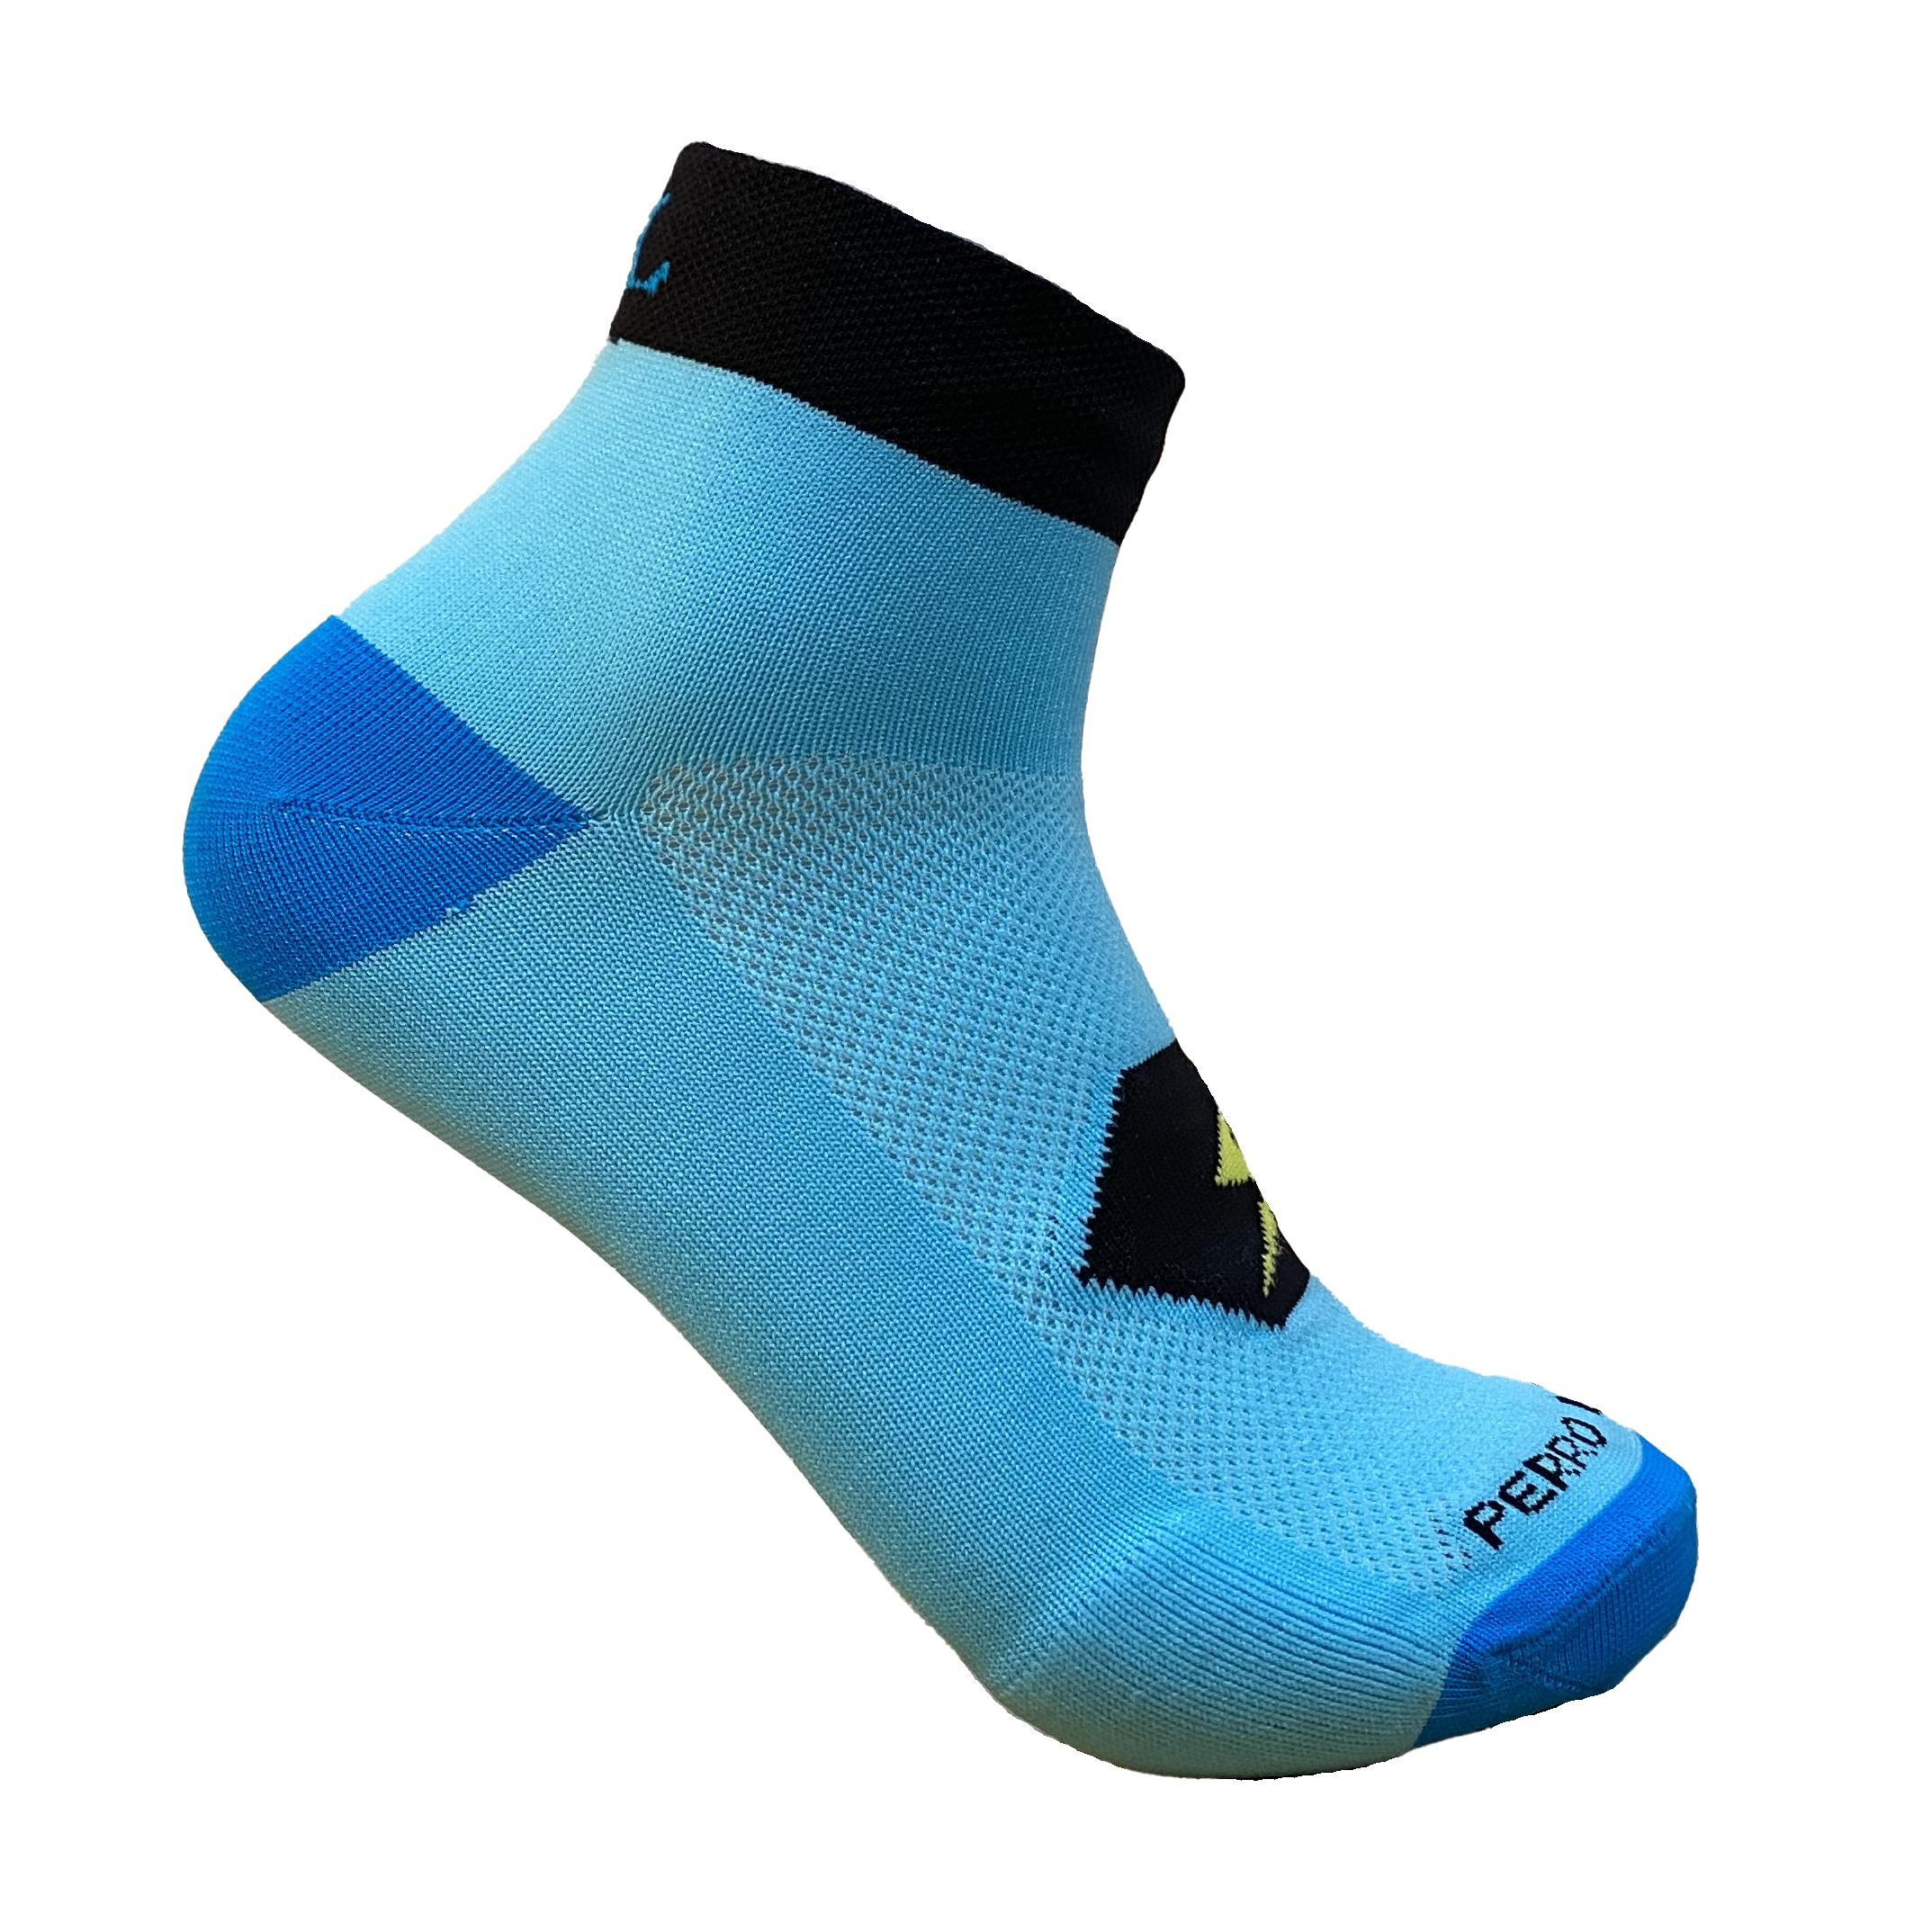 Calcetines para correr tobilleros azul